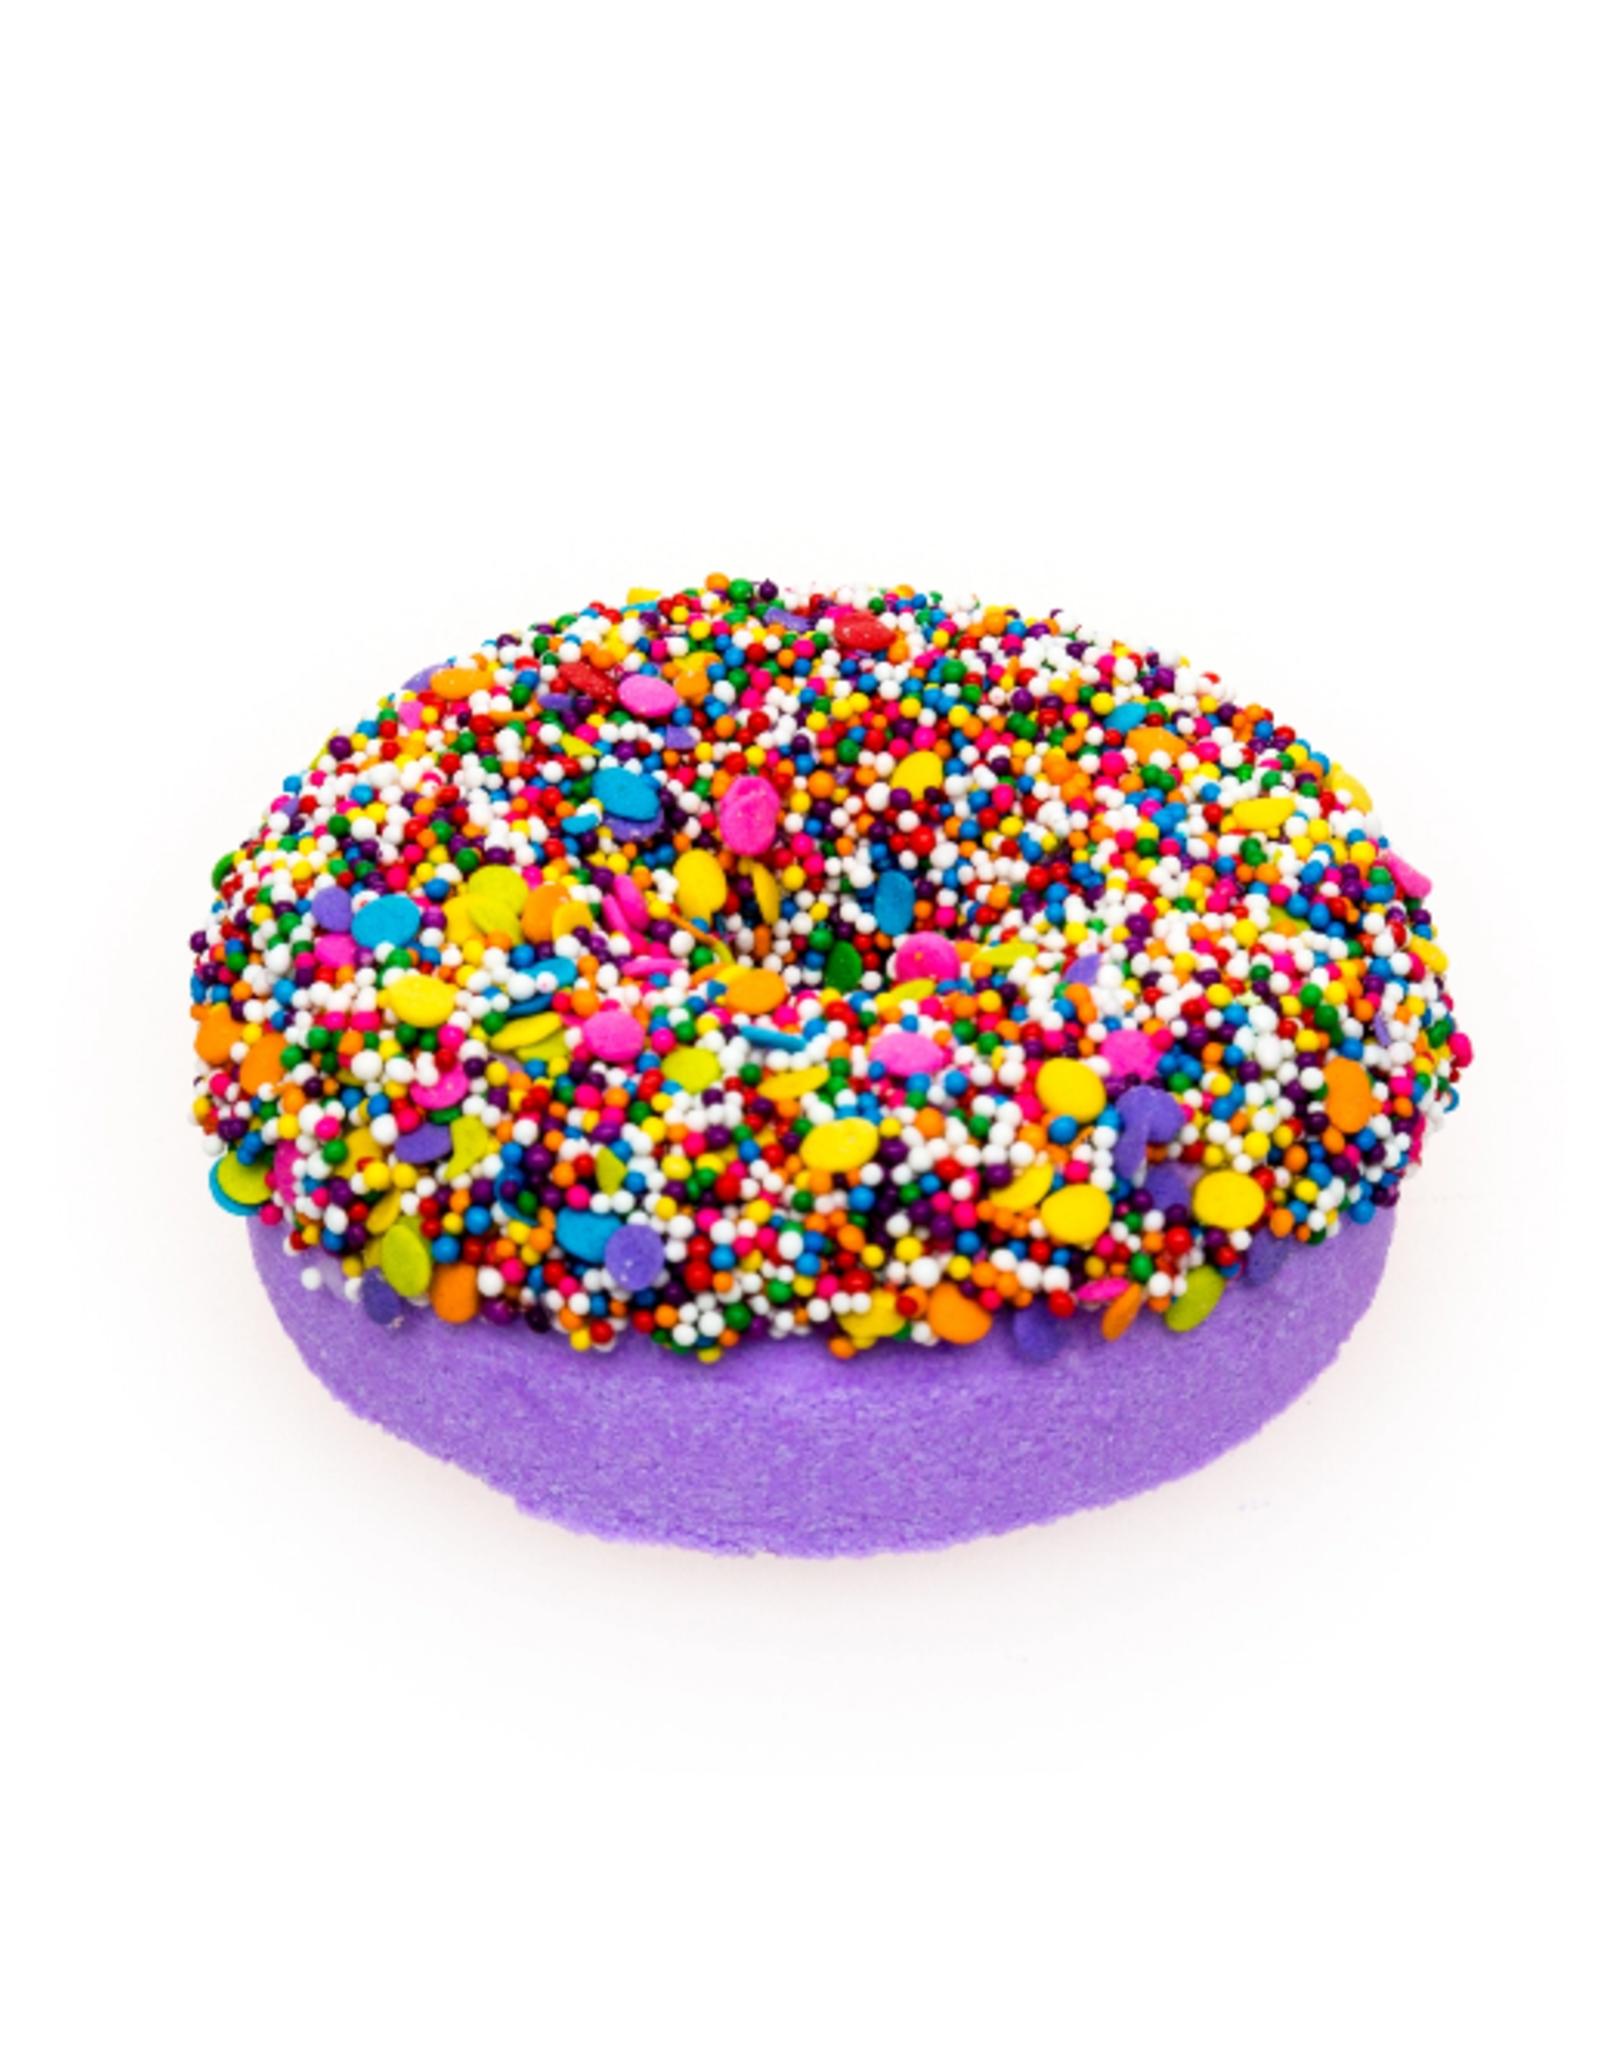 Wink Lavender Fizz Donut Bath Bomb